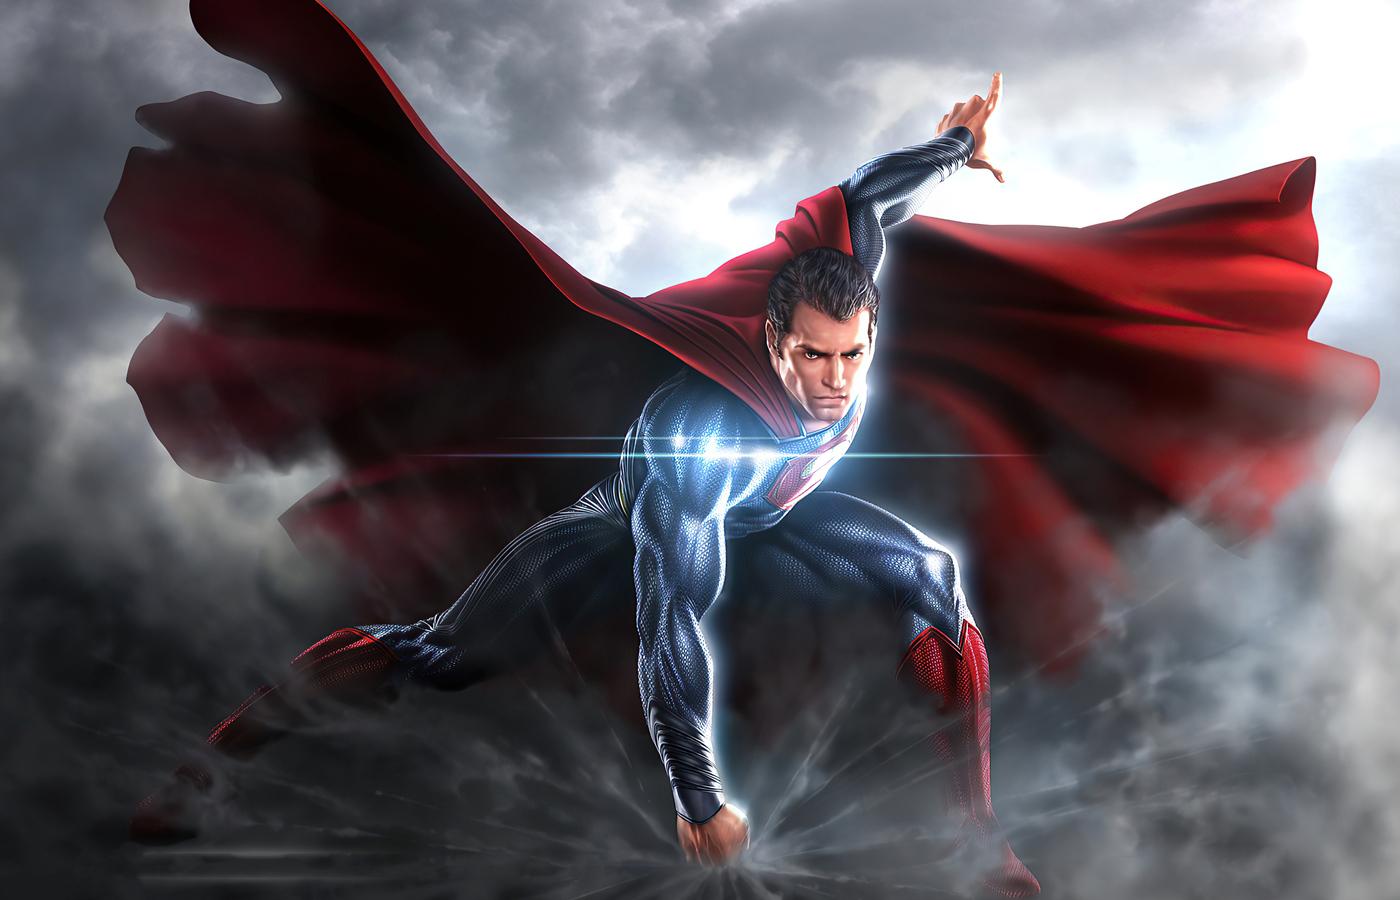 superman-2020-artwork-4k-te.jpg